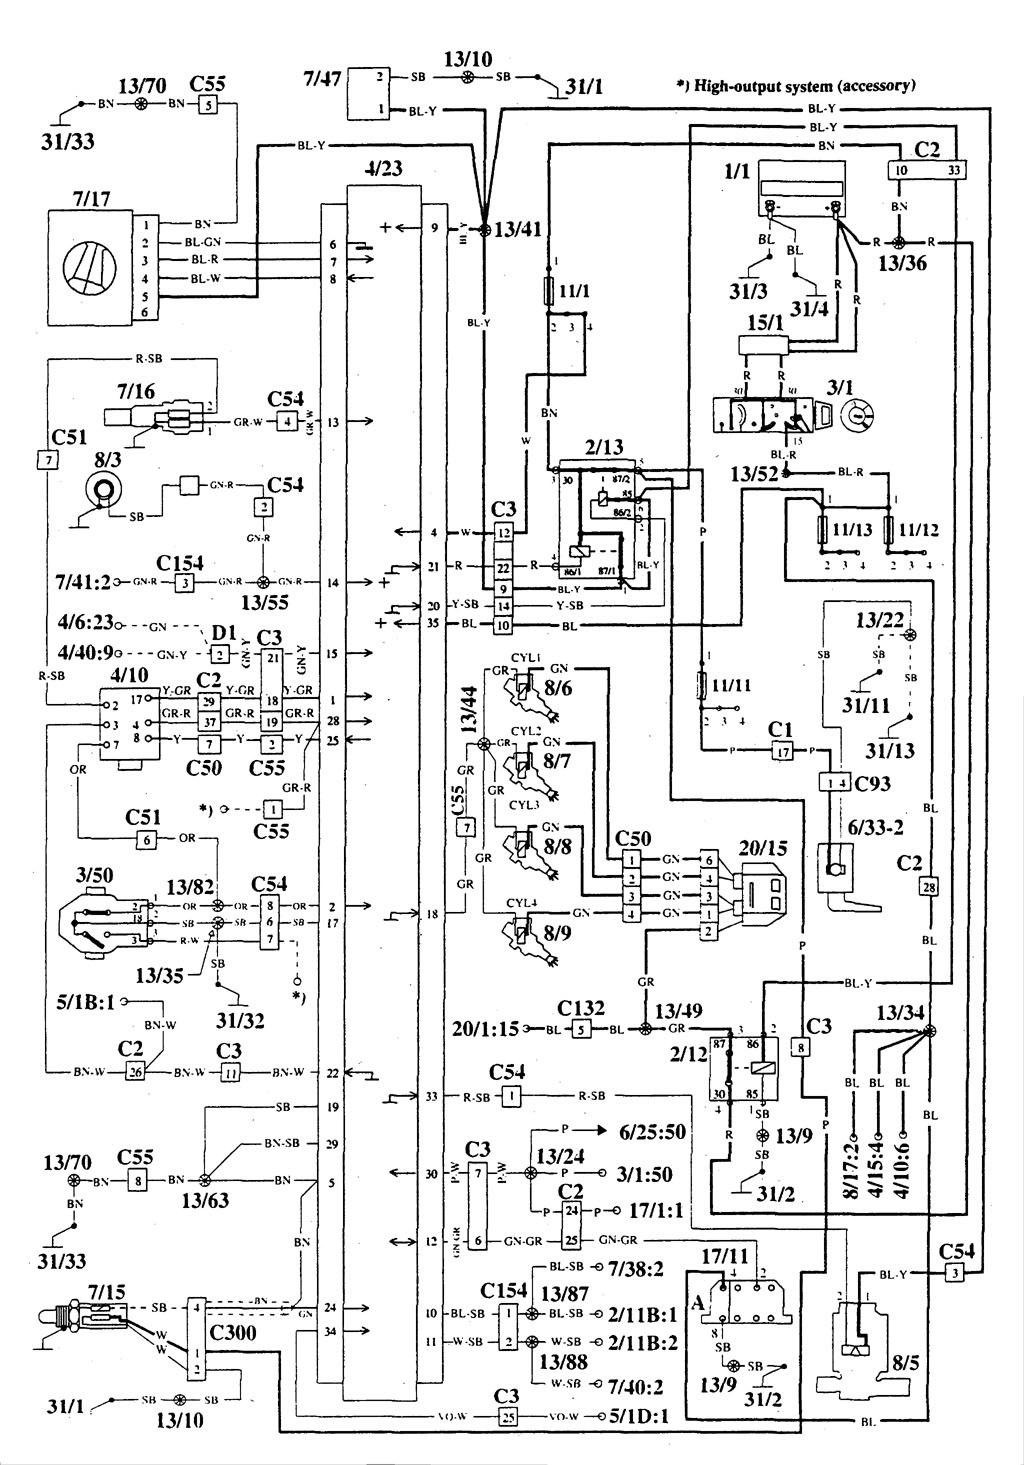 [DIAGRAM] Volvo 940 Overdrive Wiring Diagram FULL Version